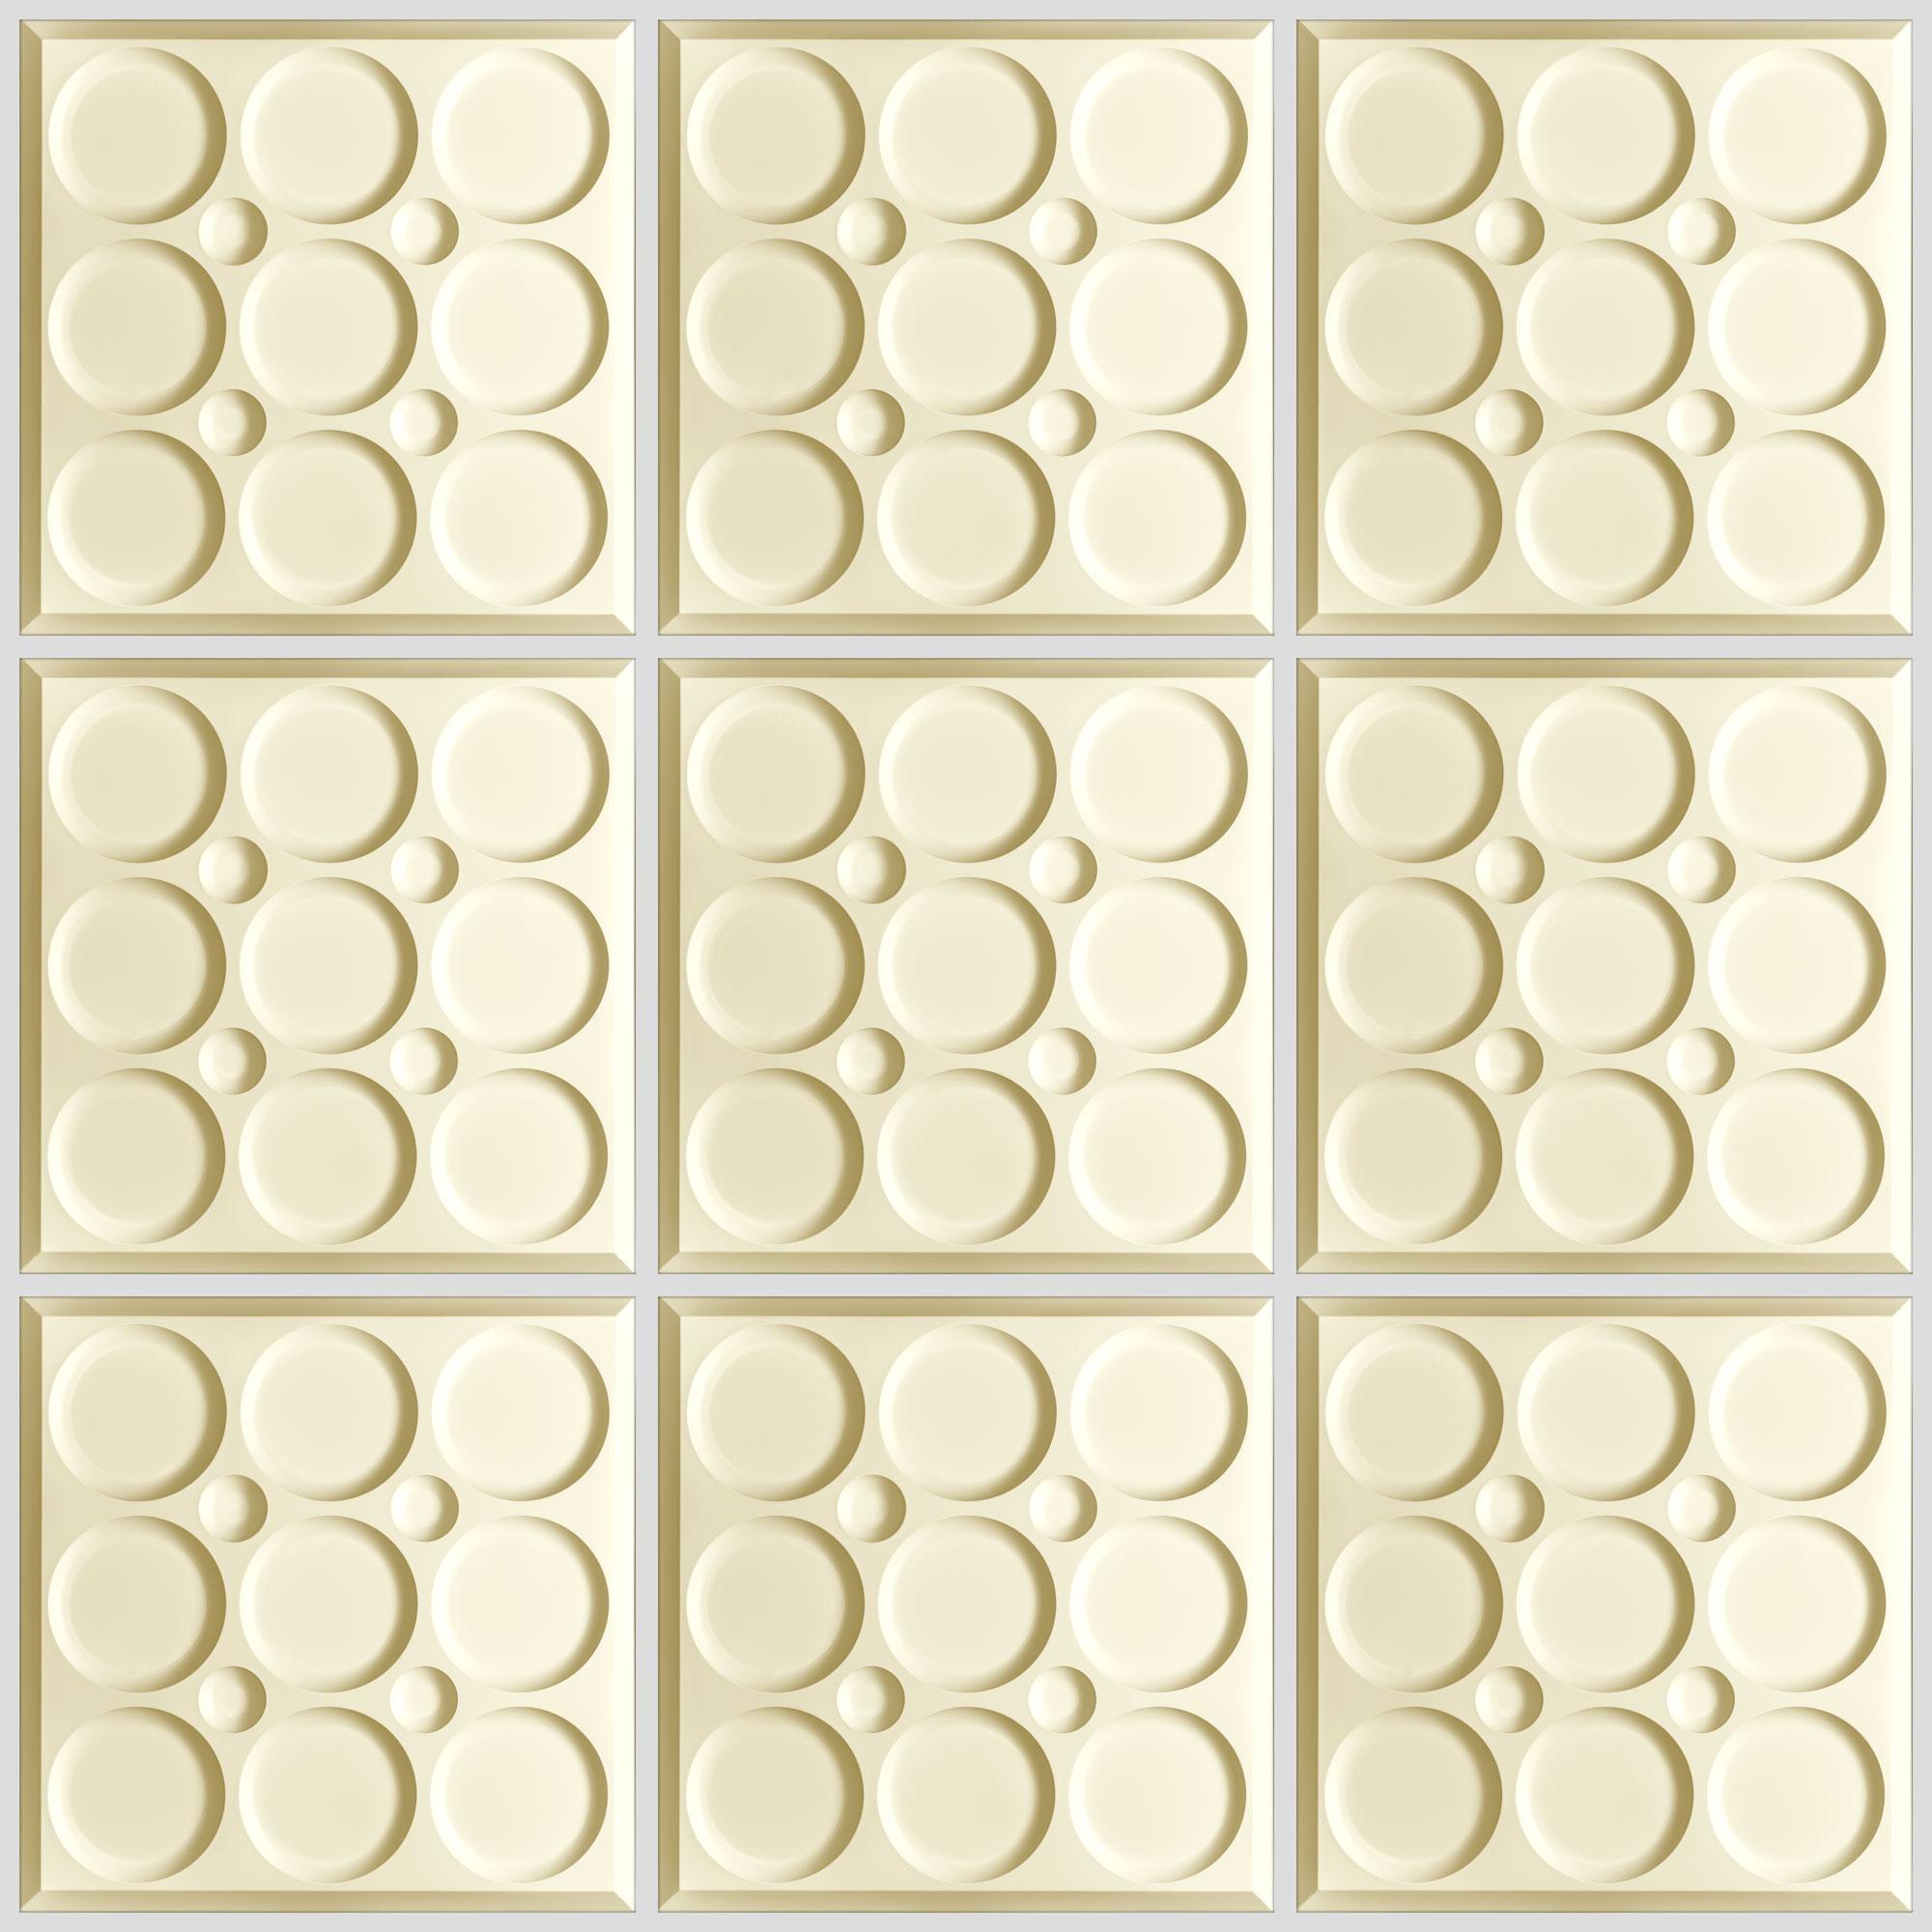 Roman Circle Ceiling Tiles